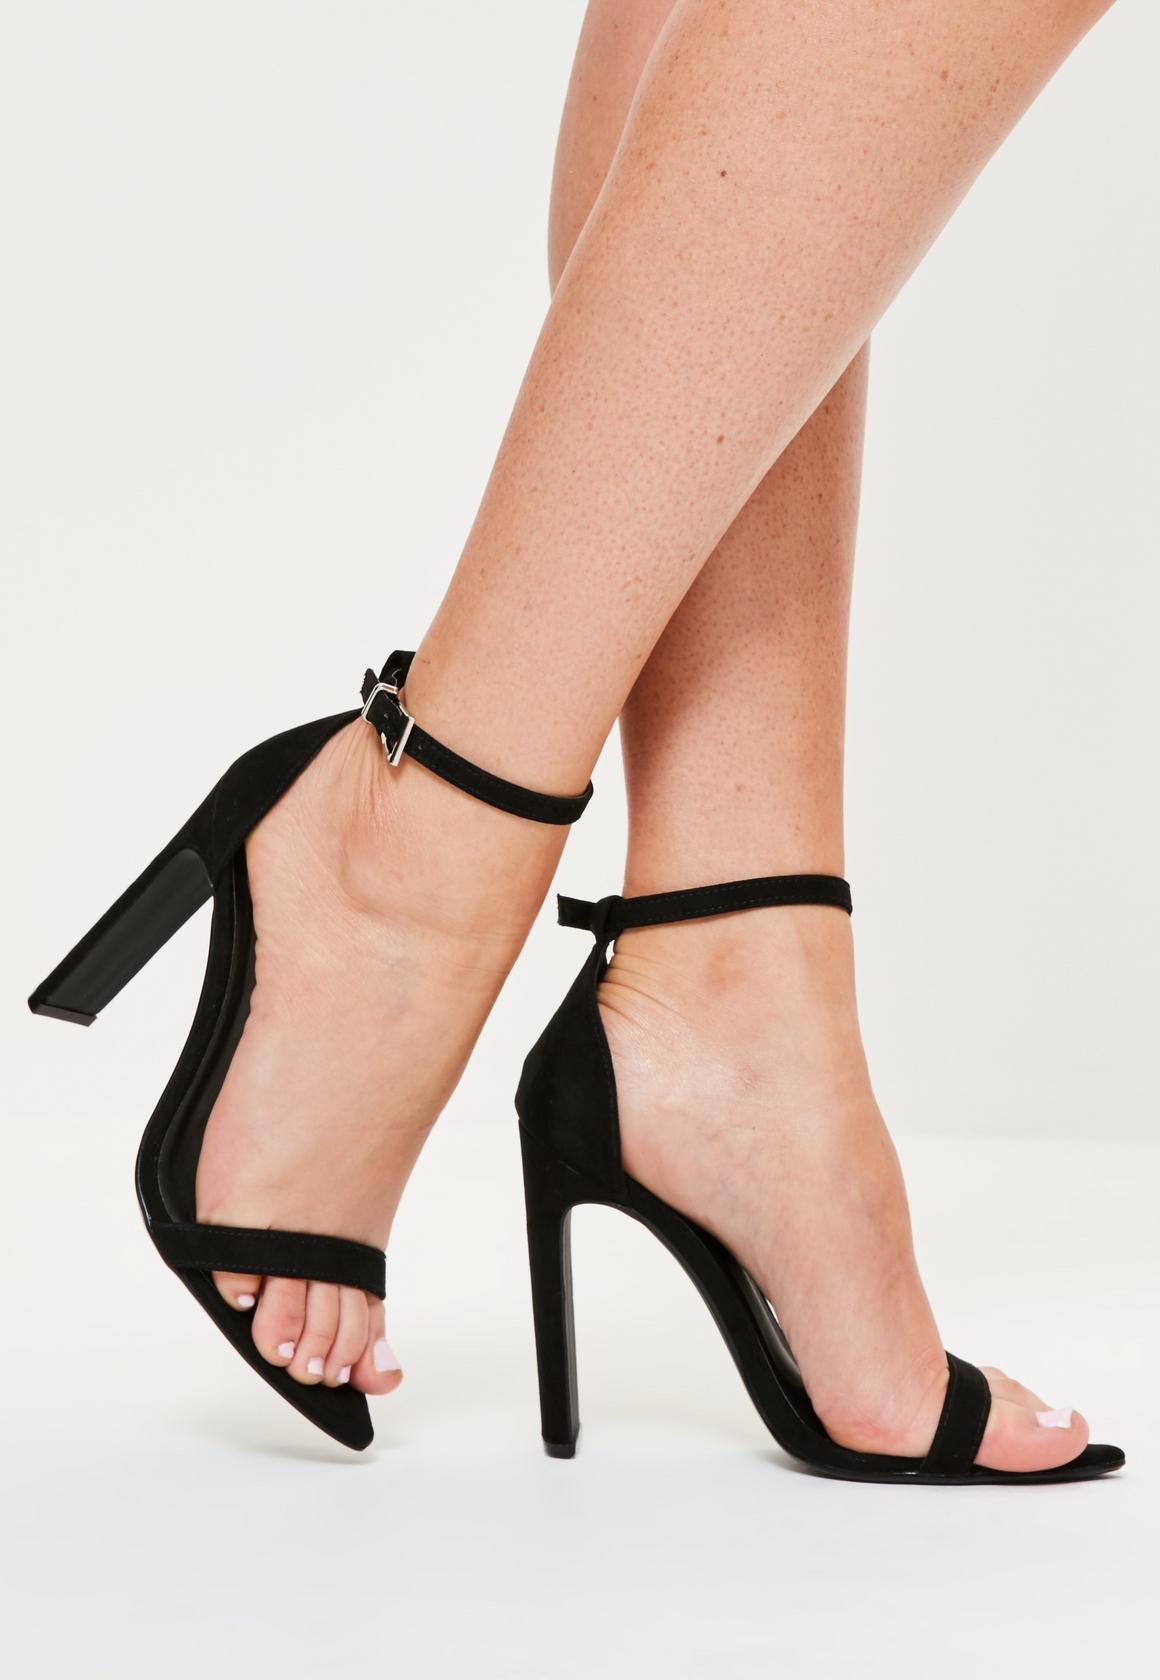 black heels previous next plarpkp